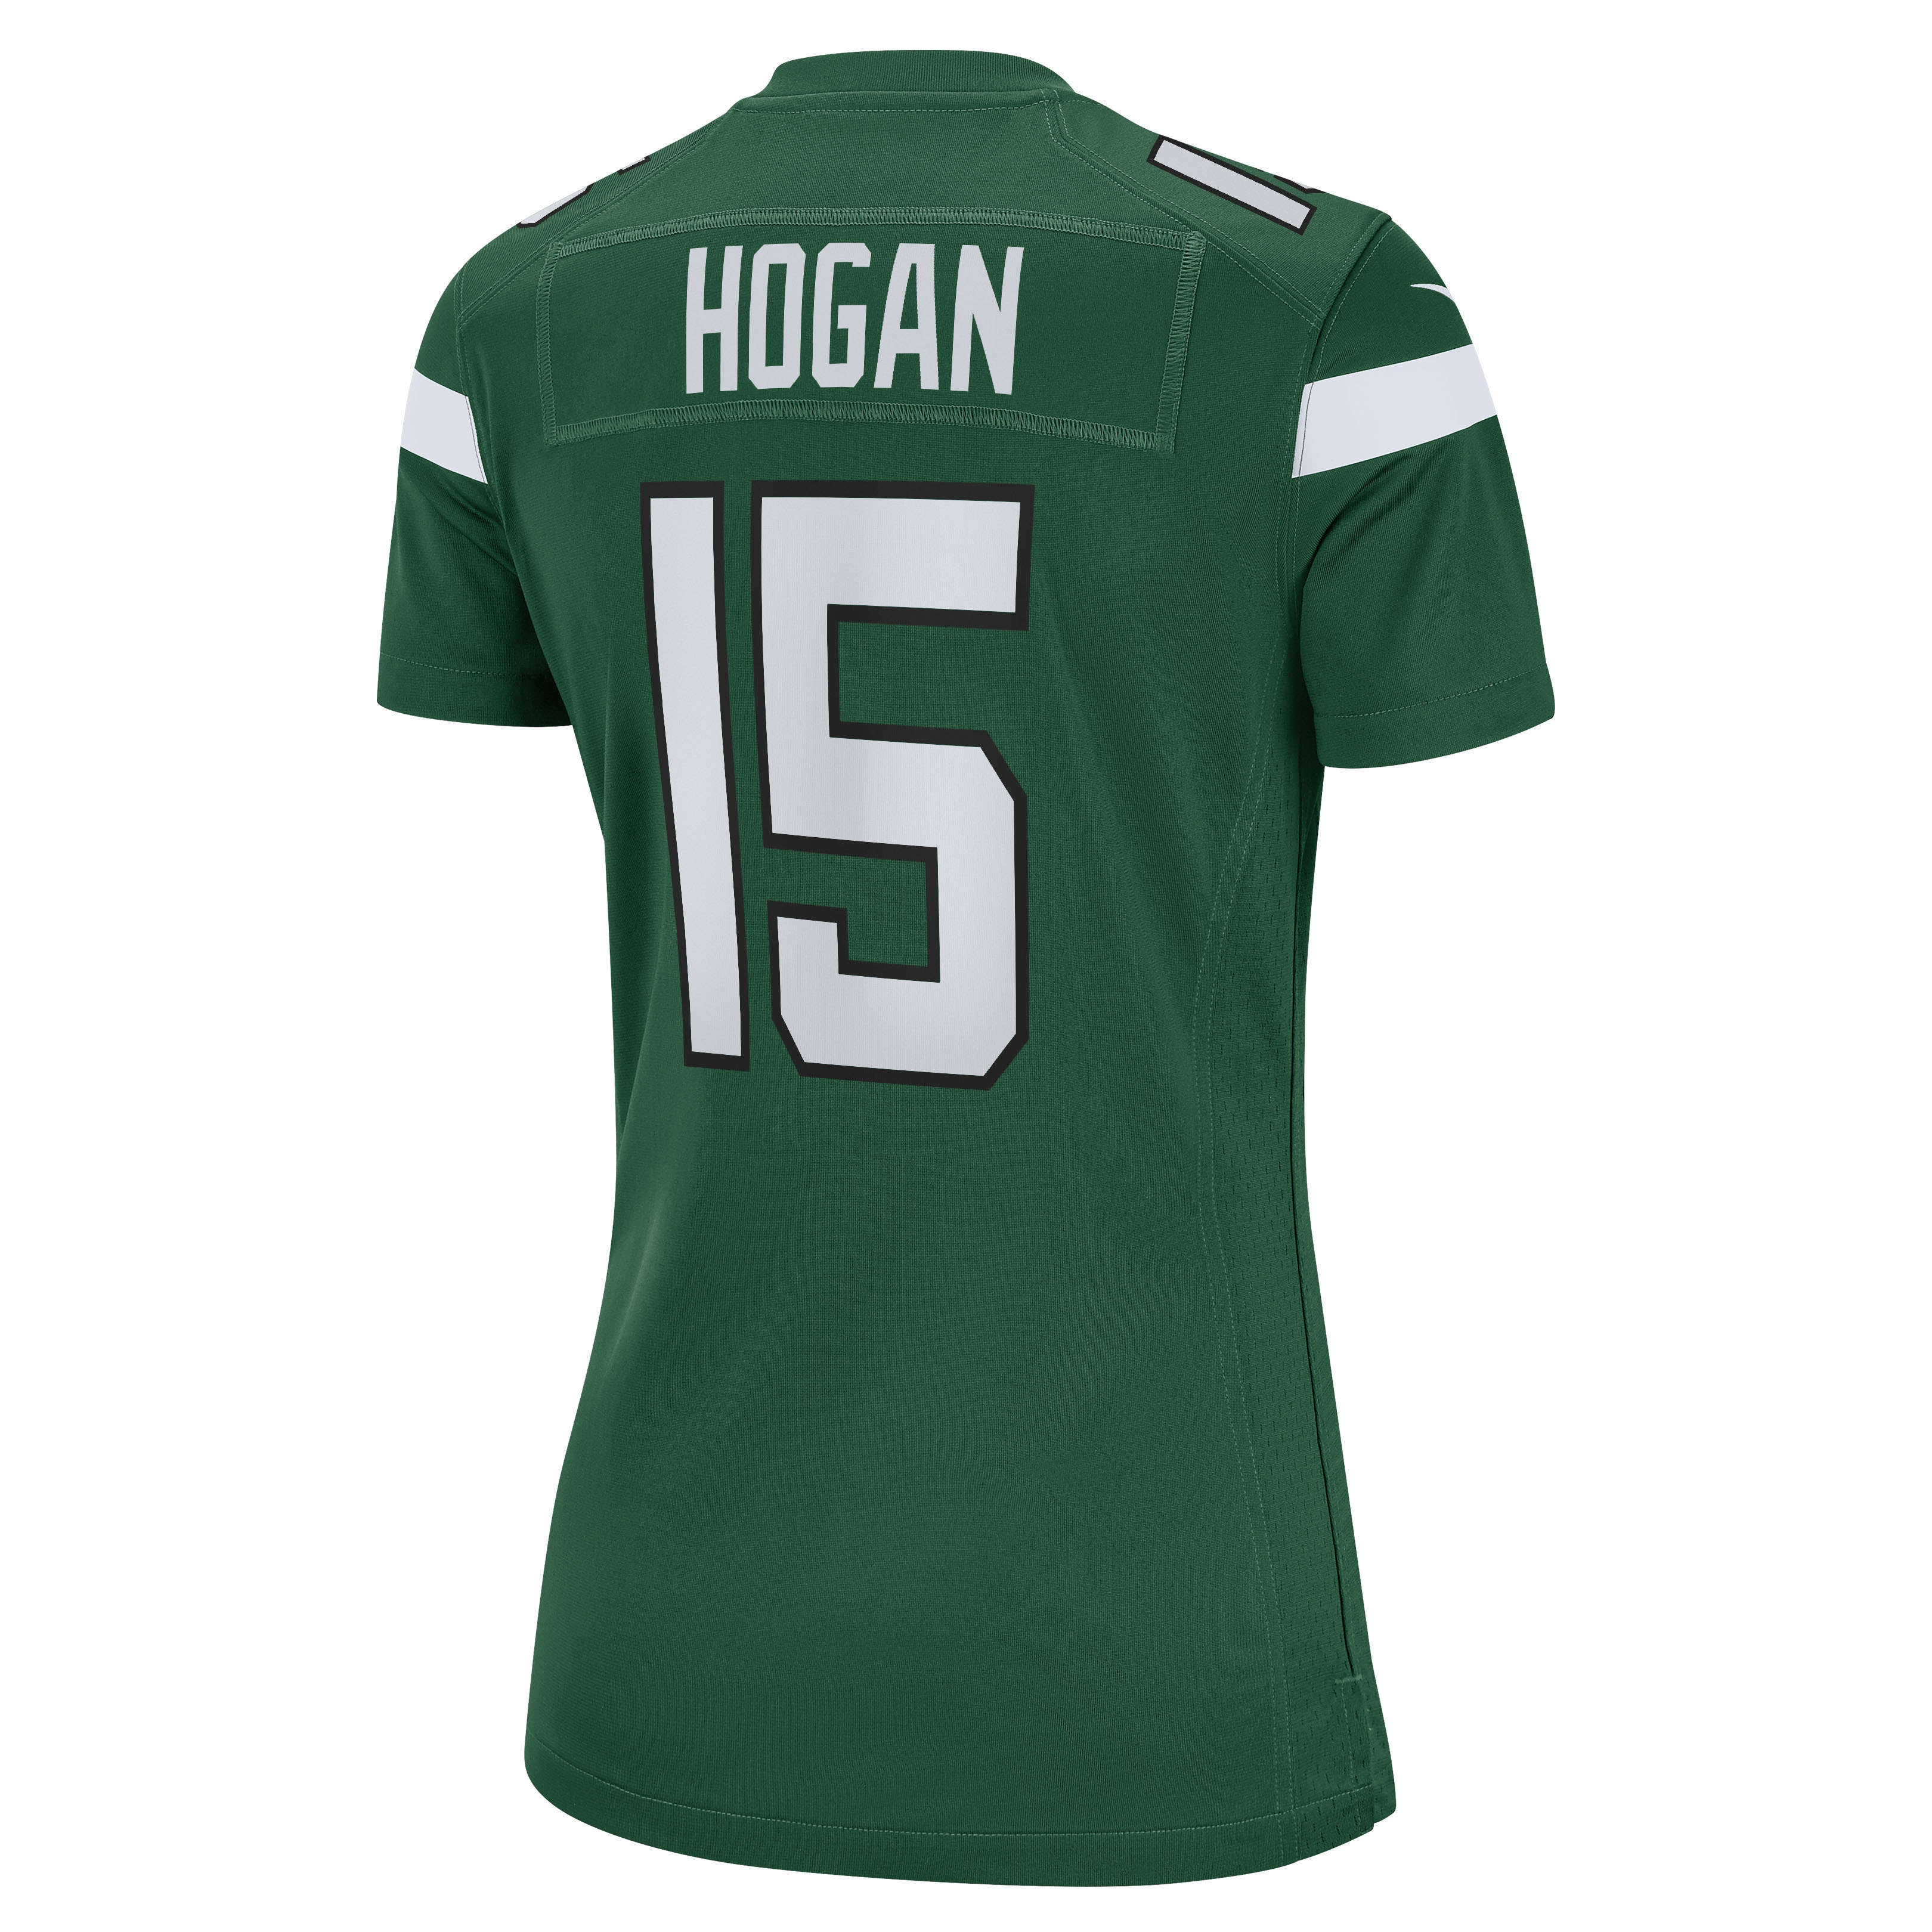 Chris Hogan New York Jets Nike Women's Team Game Jersey - Gotham Green